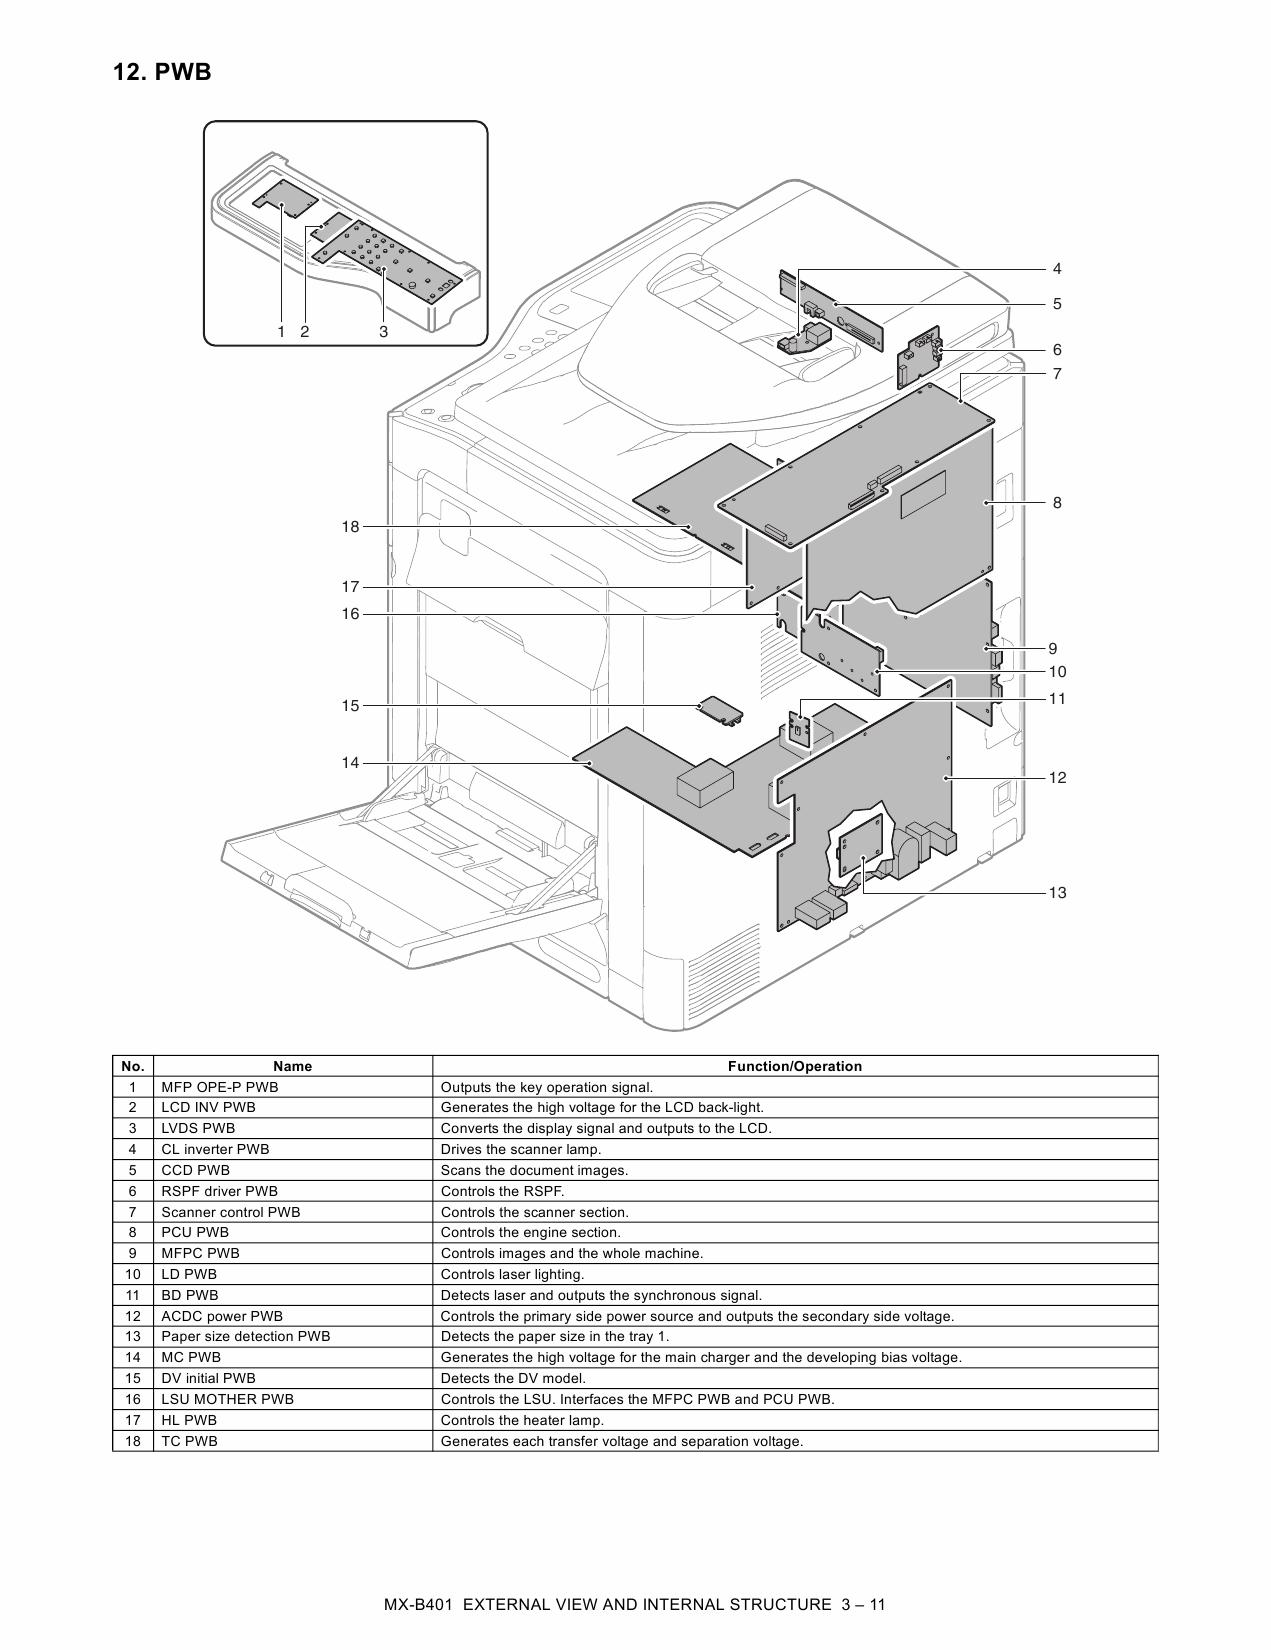 sharp mx 2640n service manual